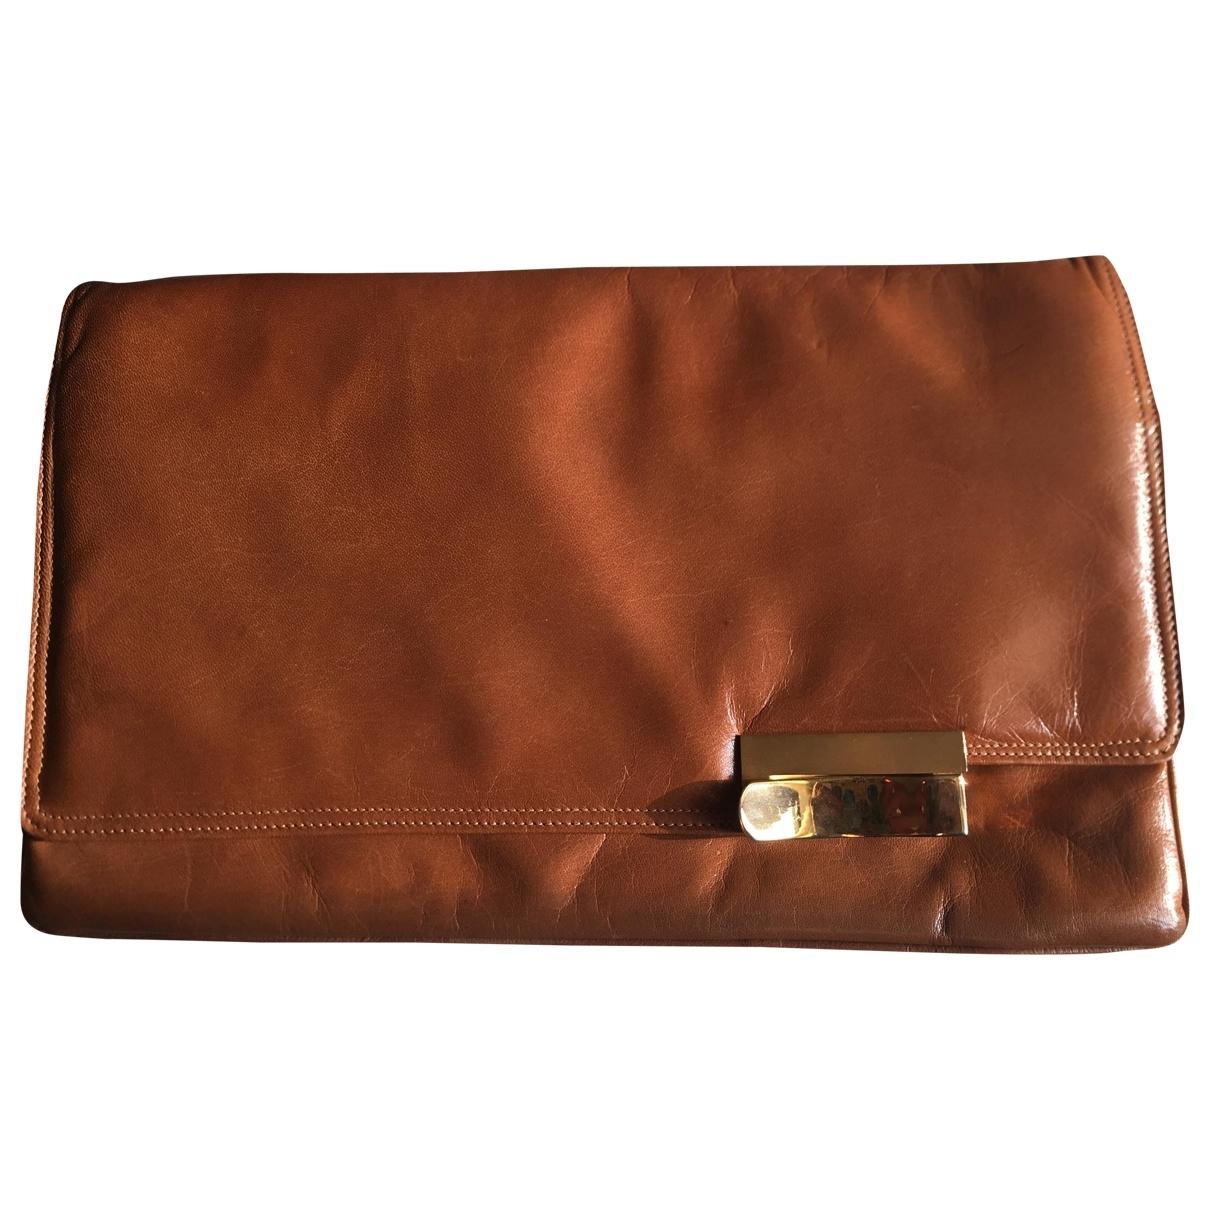 Bottega Veneta \N Brown Leather Clutch bag for Women \N